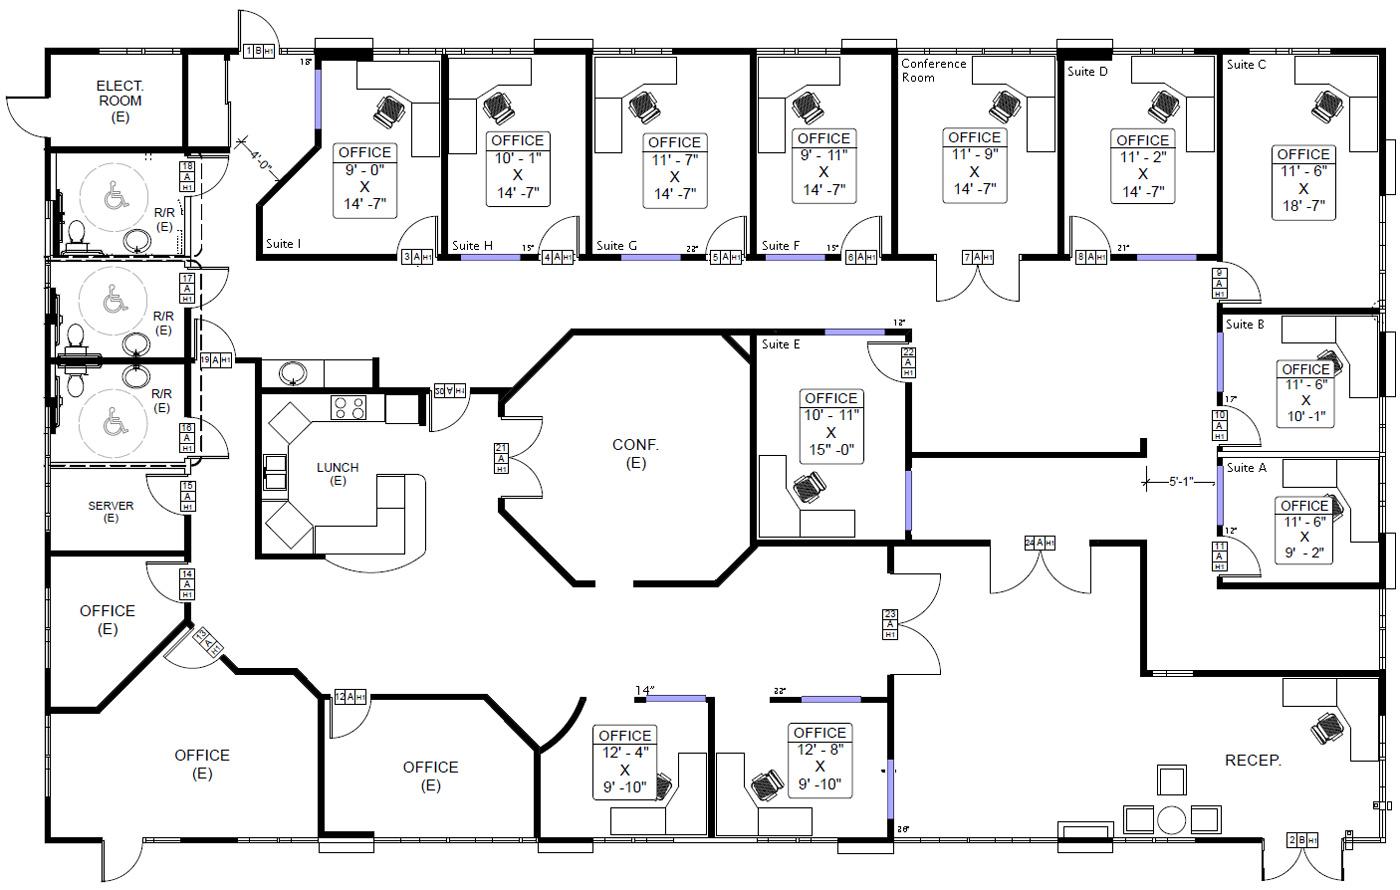 15 Commercial Office Building Design Images Commercial Office Building Floor Plans 3000 Square Foot Office Building Design And Commercial Office Building Floor Plans Newdesignfile Com